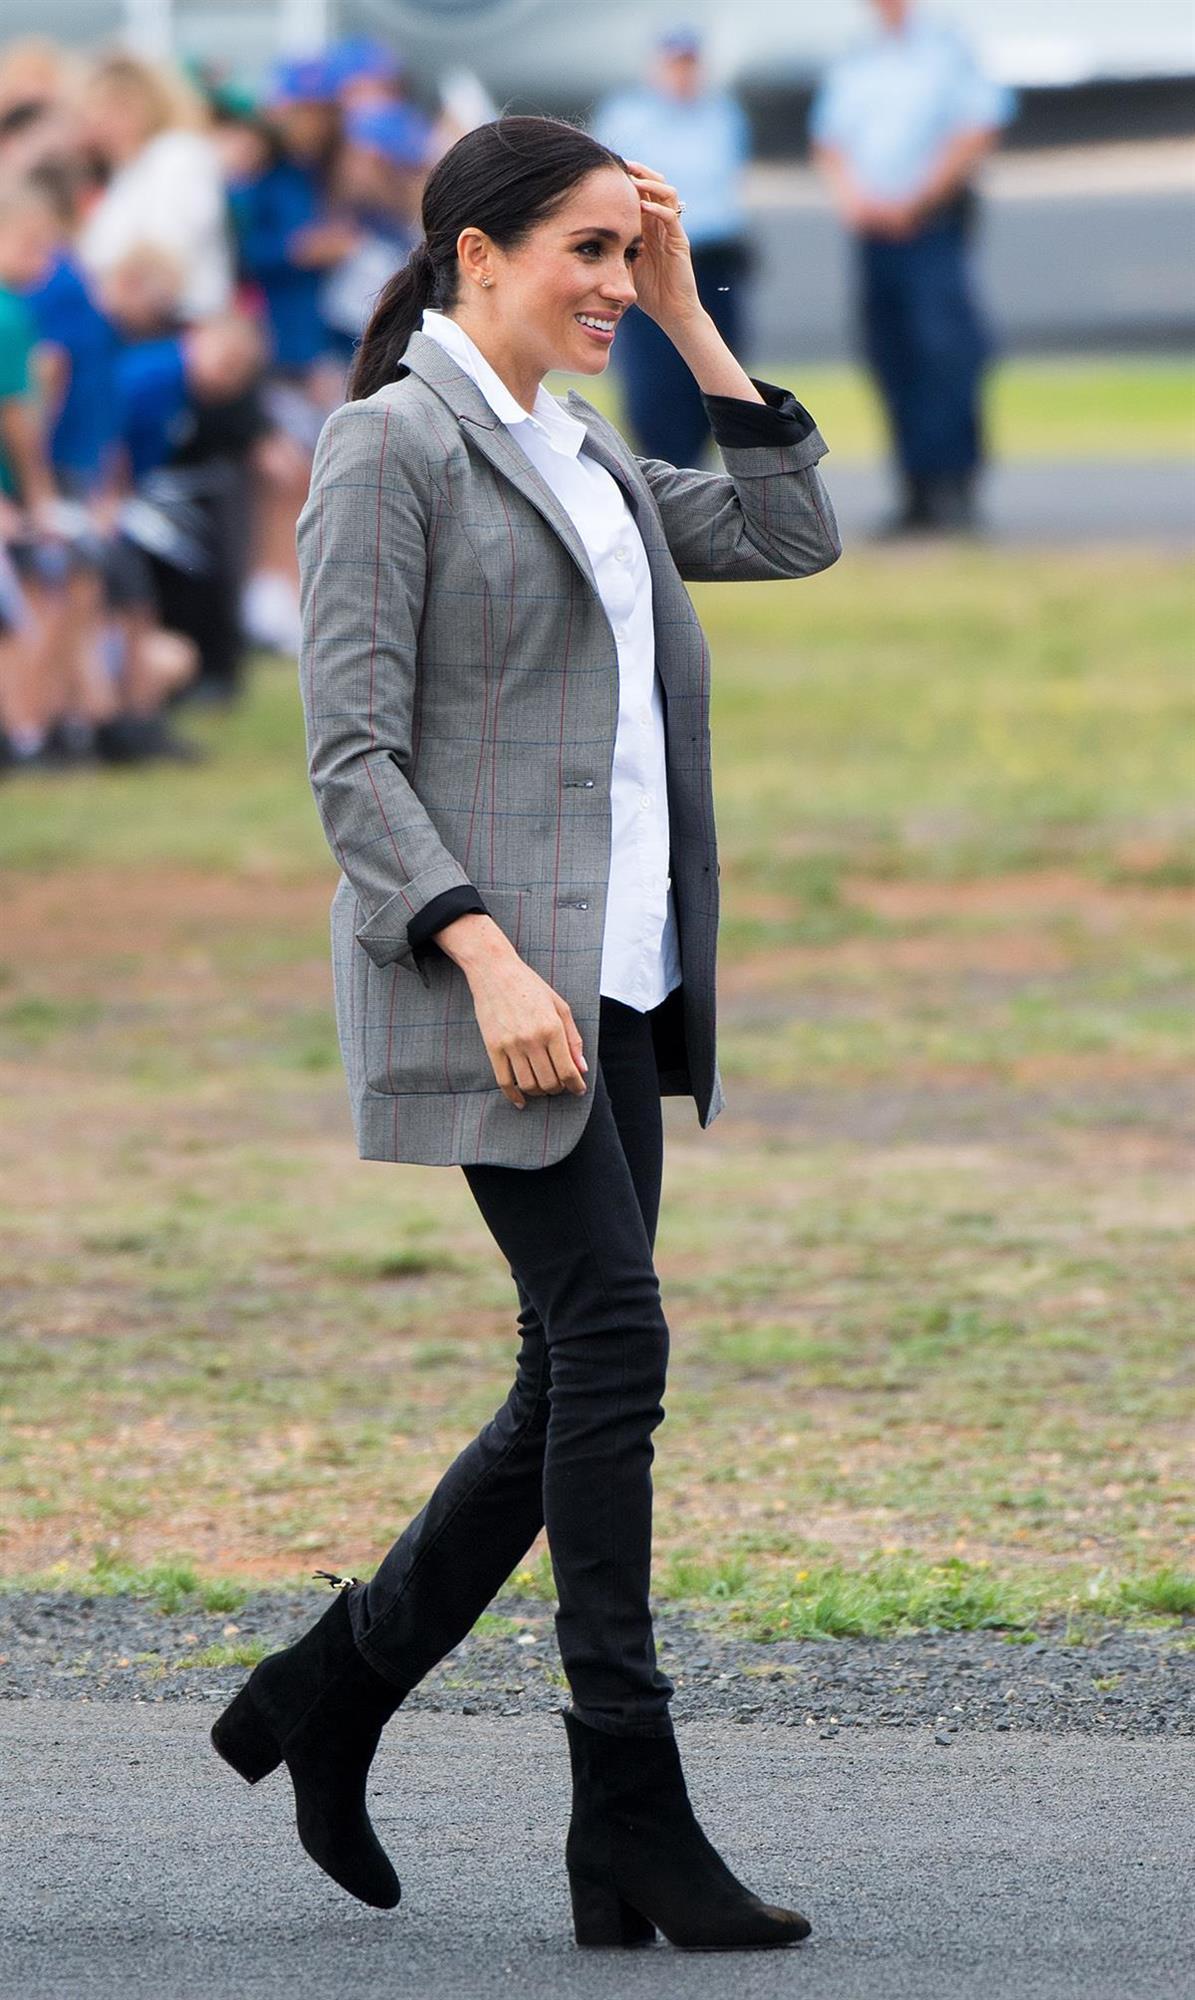 57d86a16a Todos los looks de moda que ha agotado Meghan Markle en 2019 - InStyle